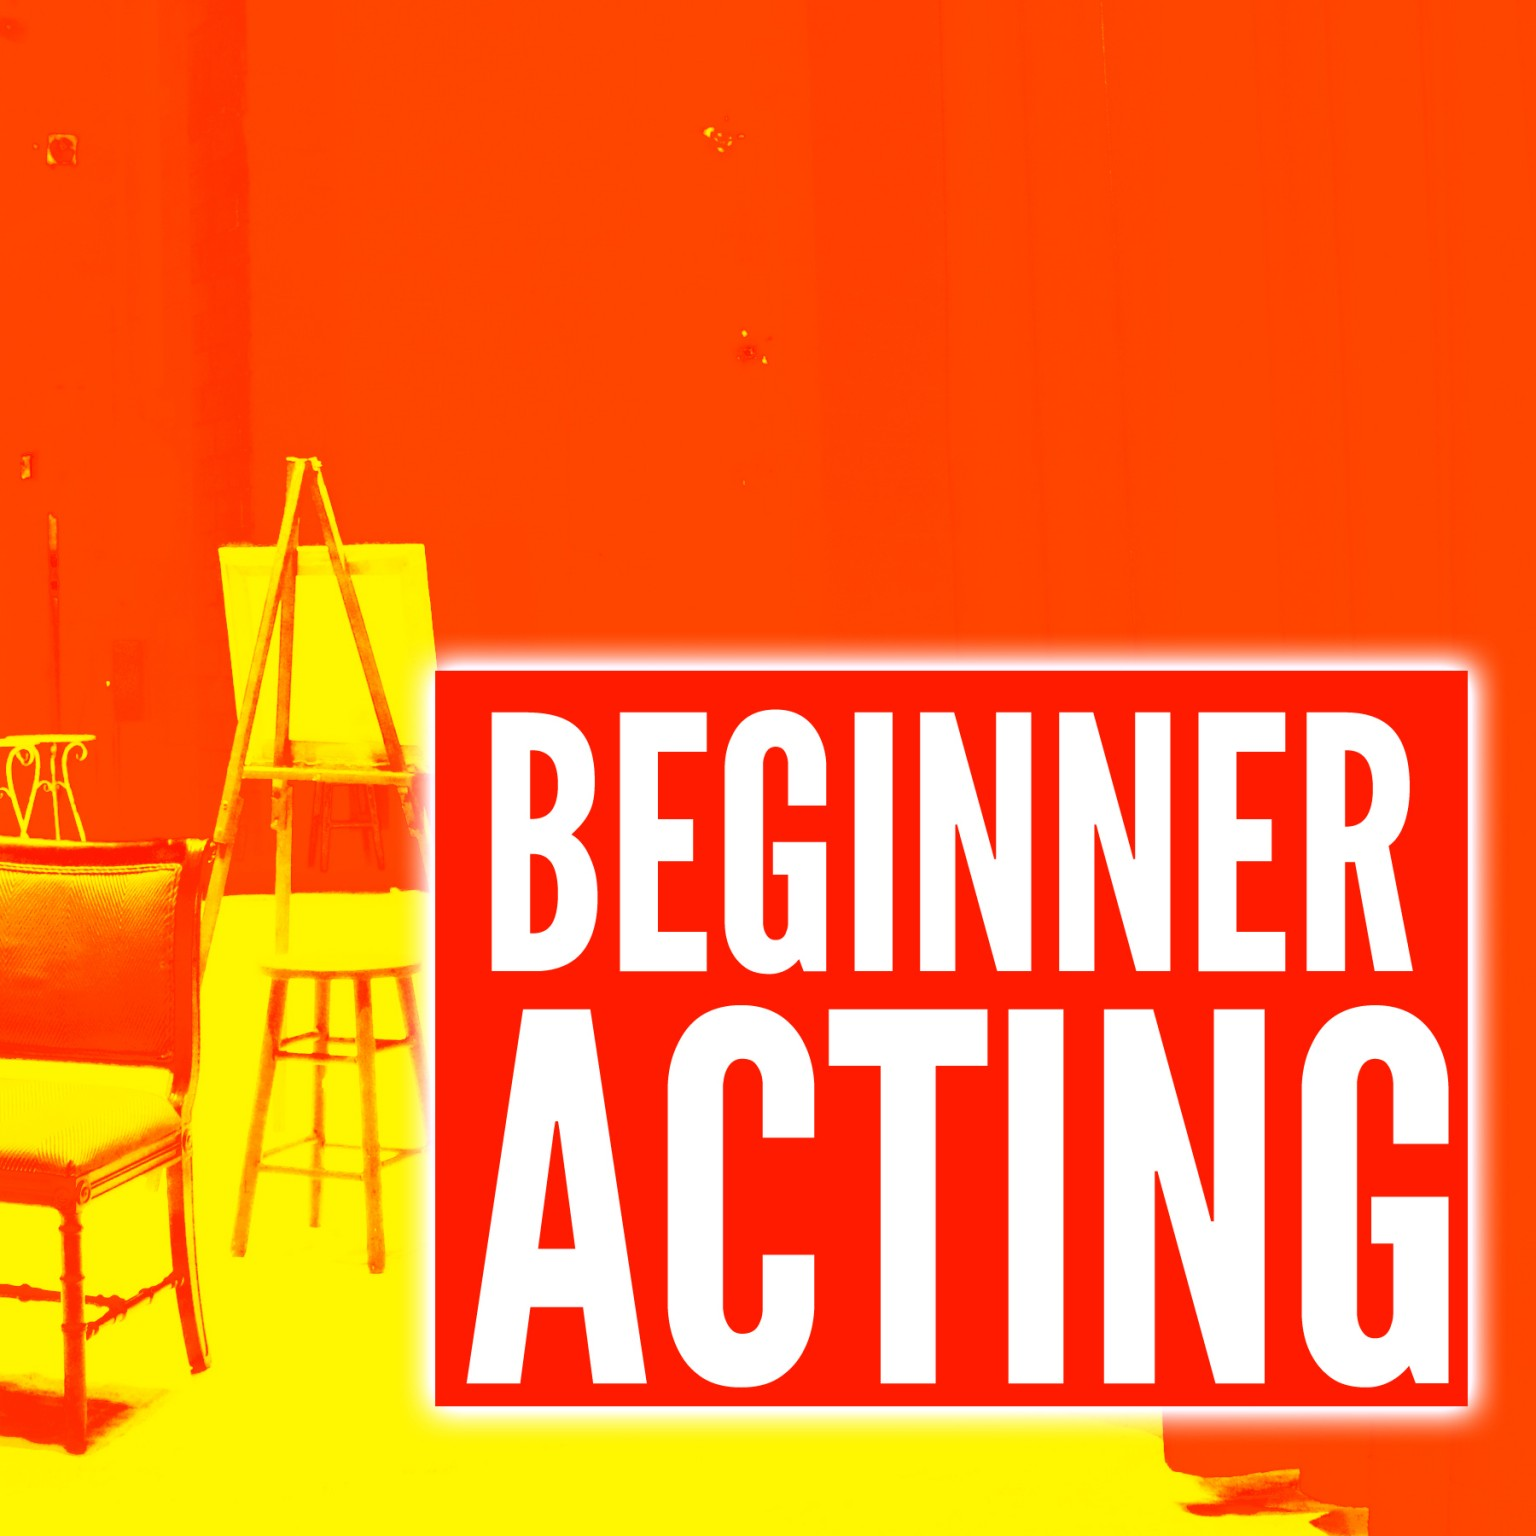 6 Beginner Acting